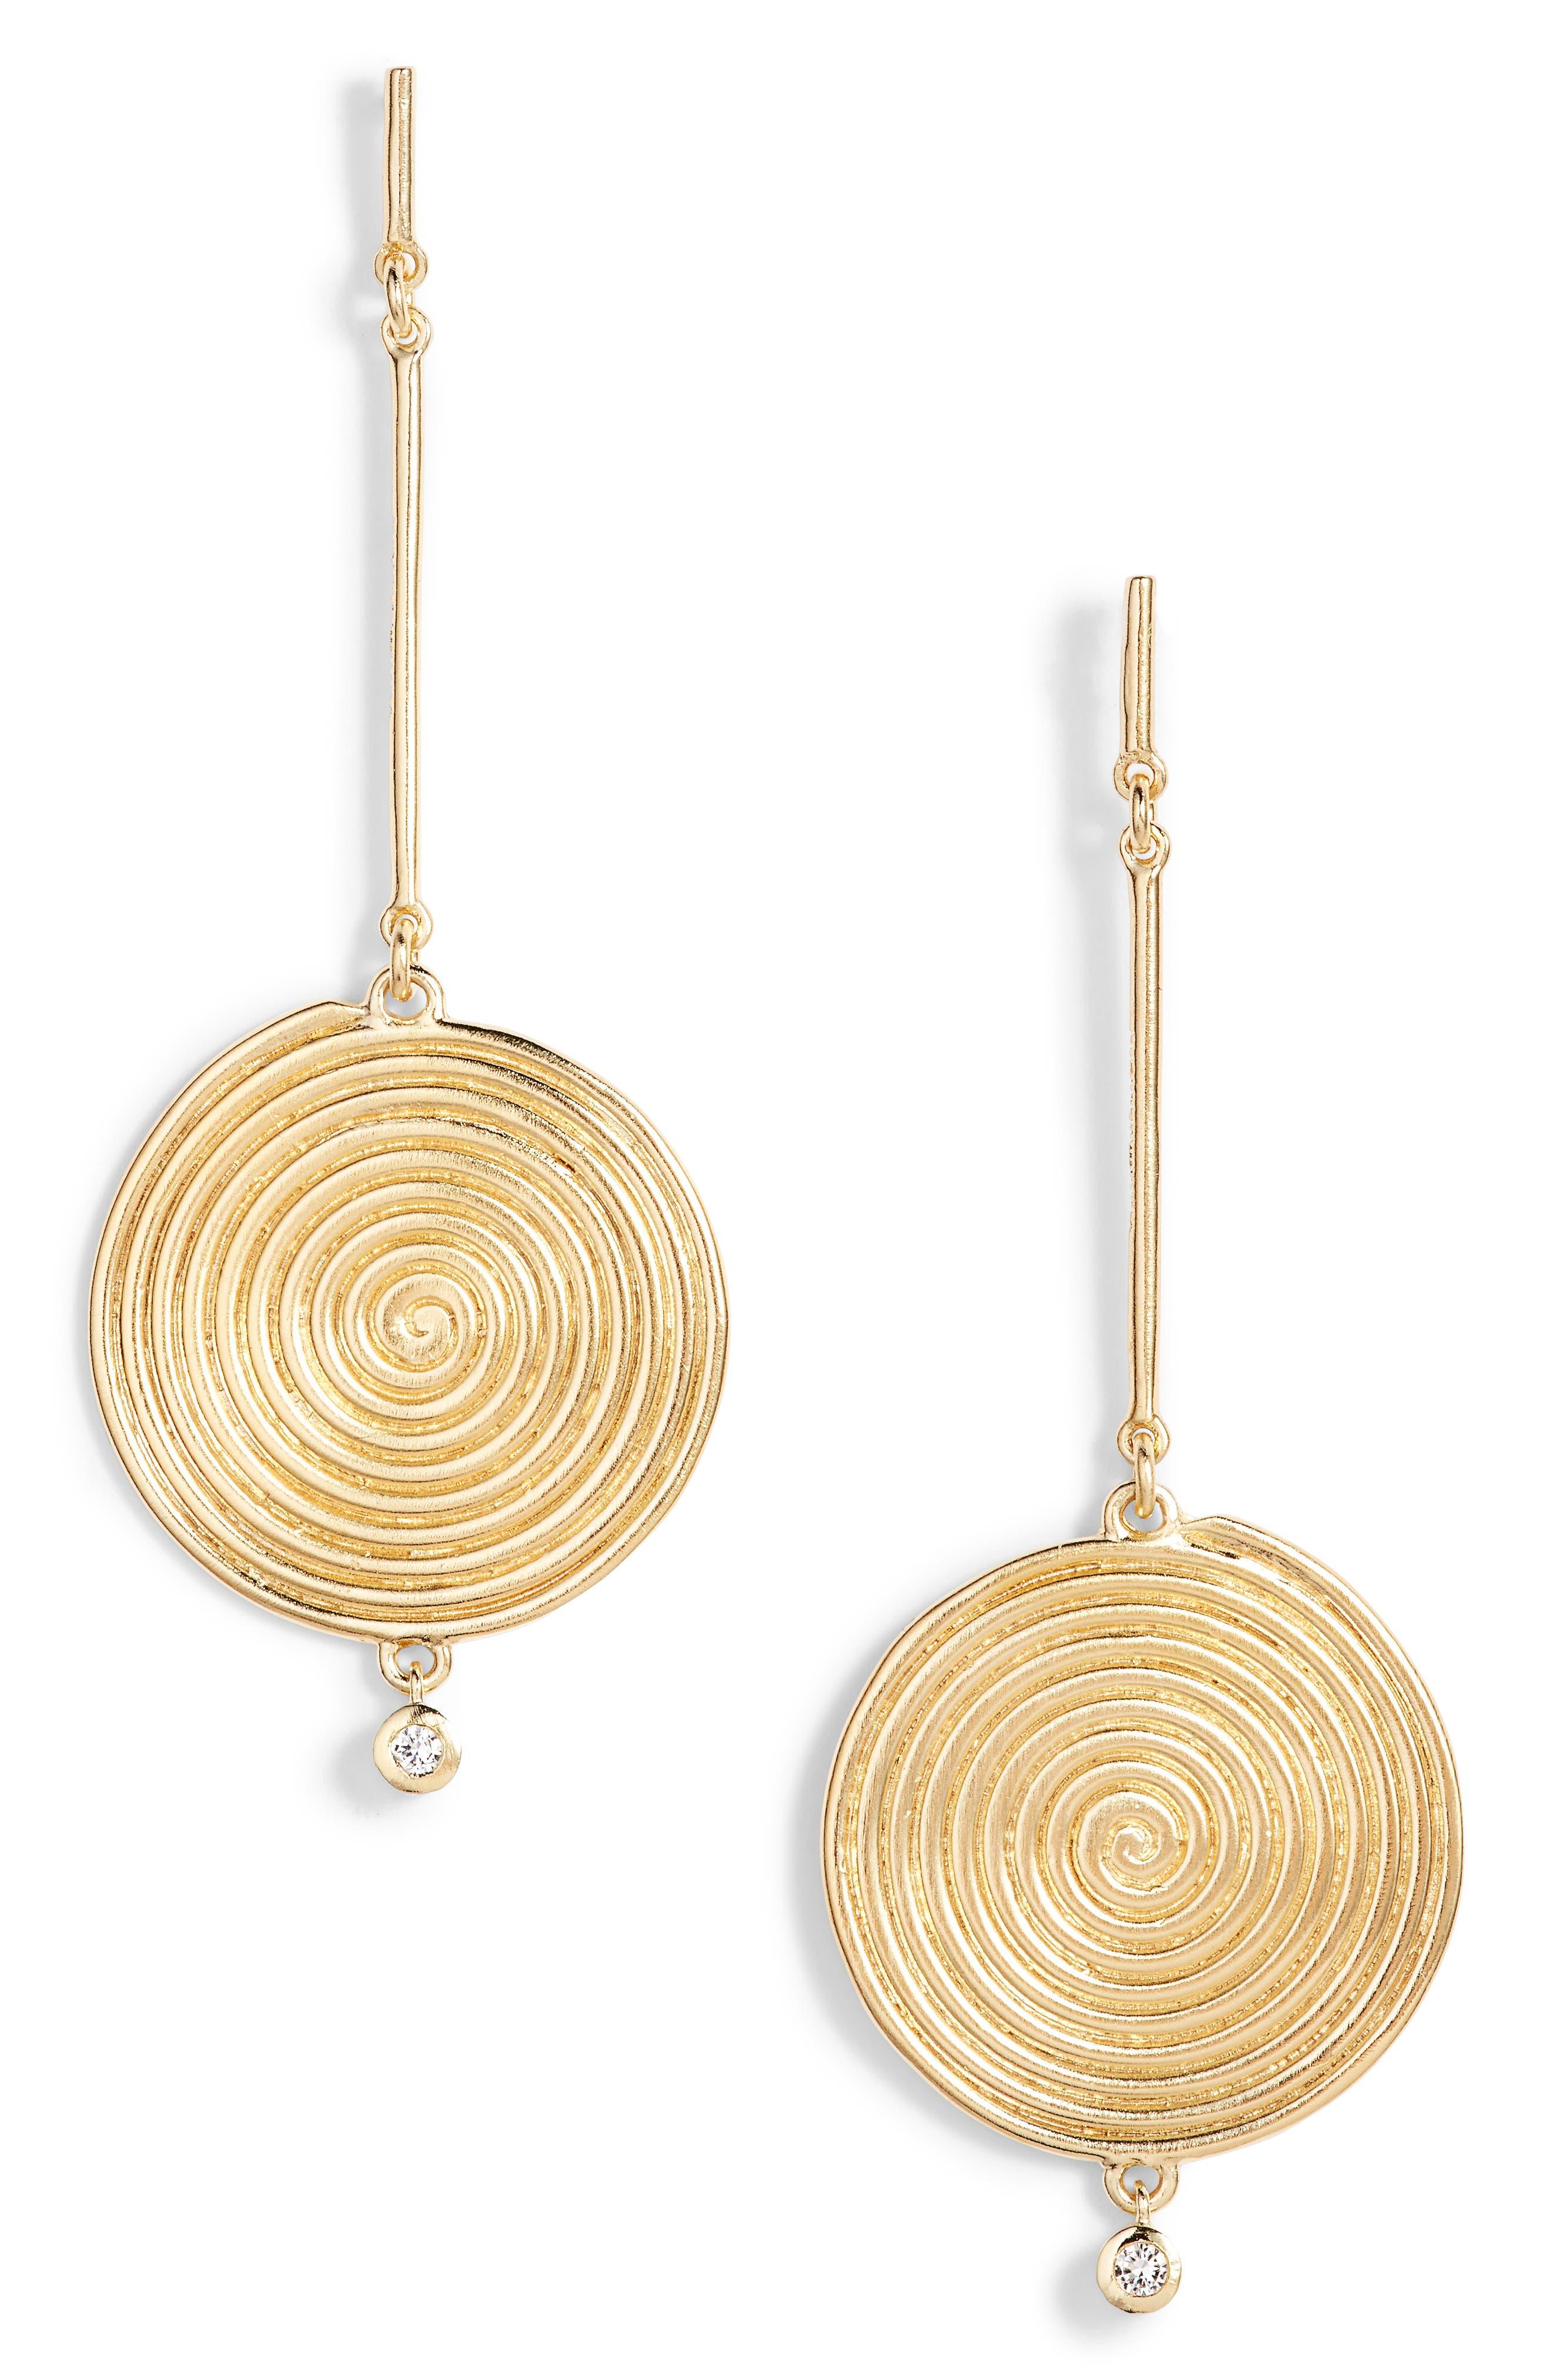 Main Image - Elizabeth and James Sullivan - Lainey White Topaz Drop Earrings